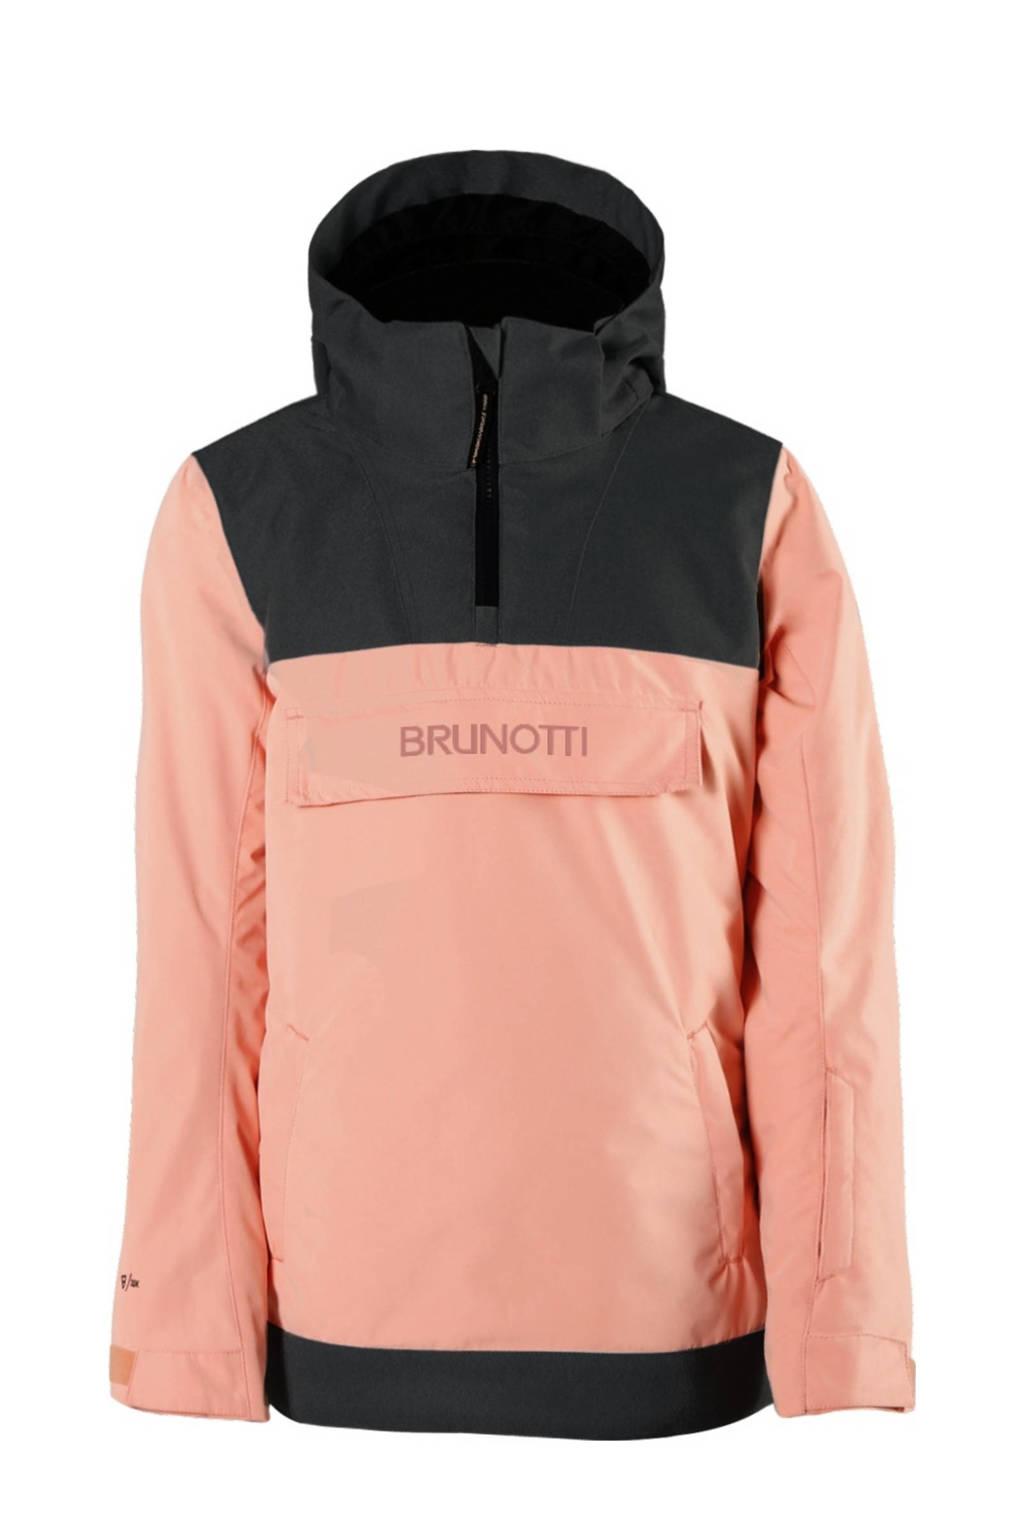 Brunotti anorak Rey jr roze/zwart, Roze/zwart